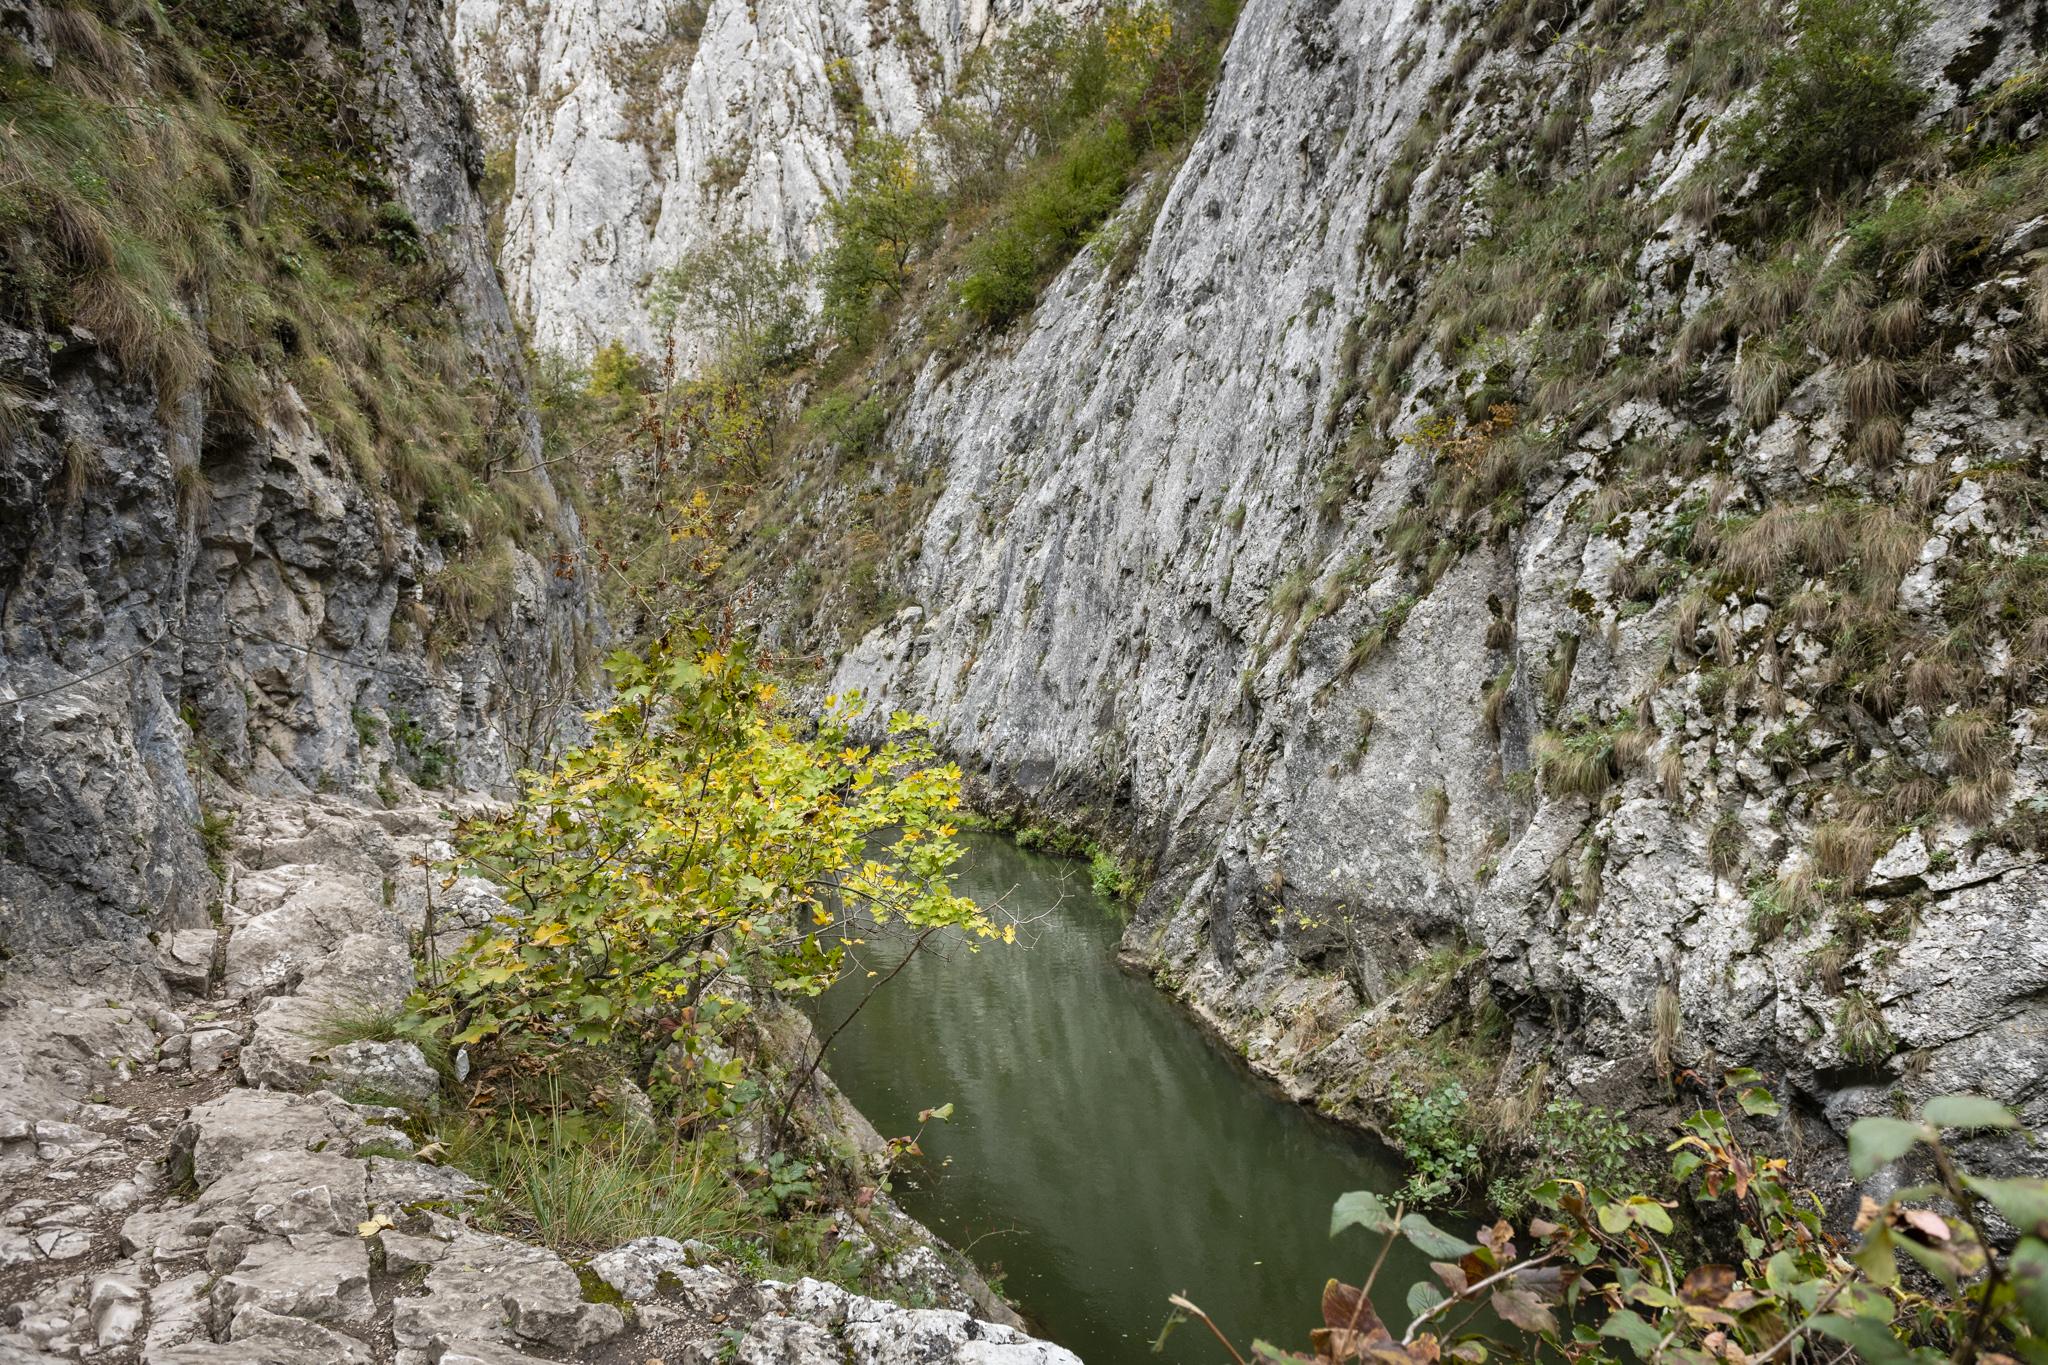 Cheile Turzii - Thorenburger Klamm / Reisebericht Rumänien